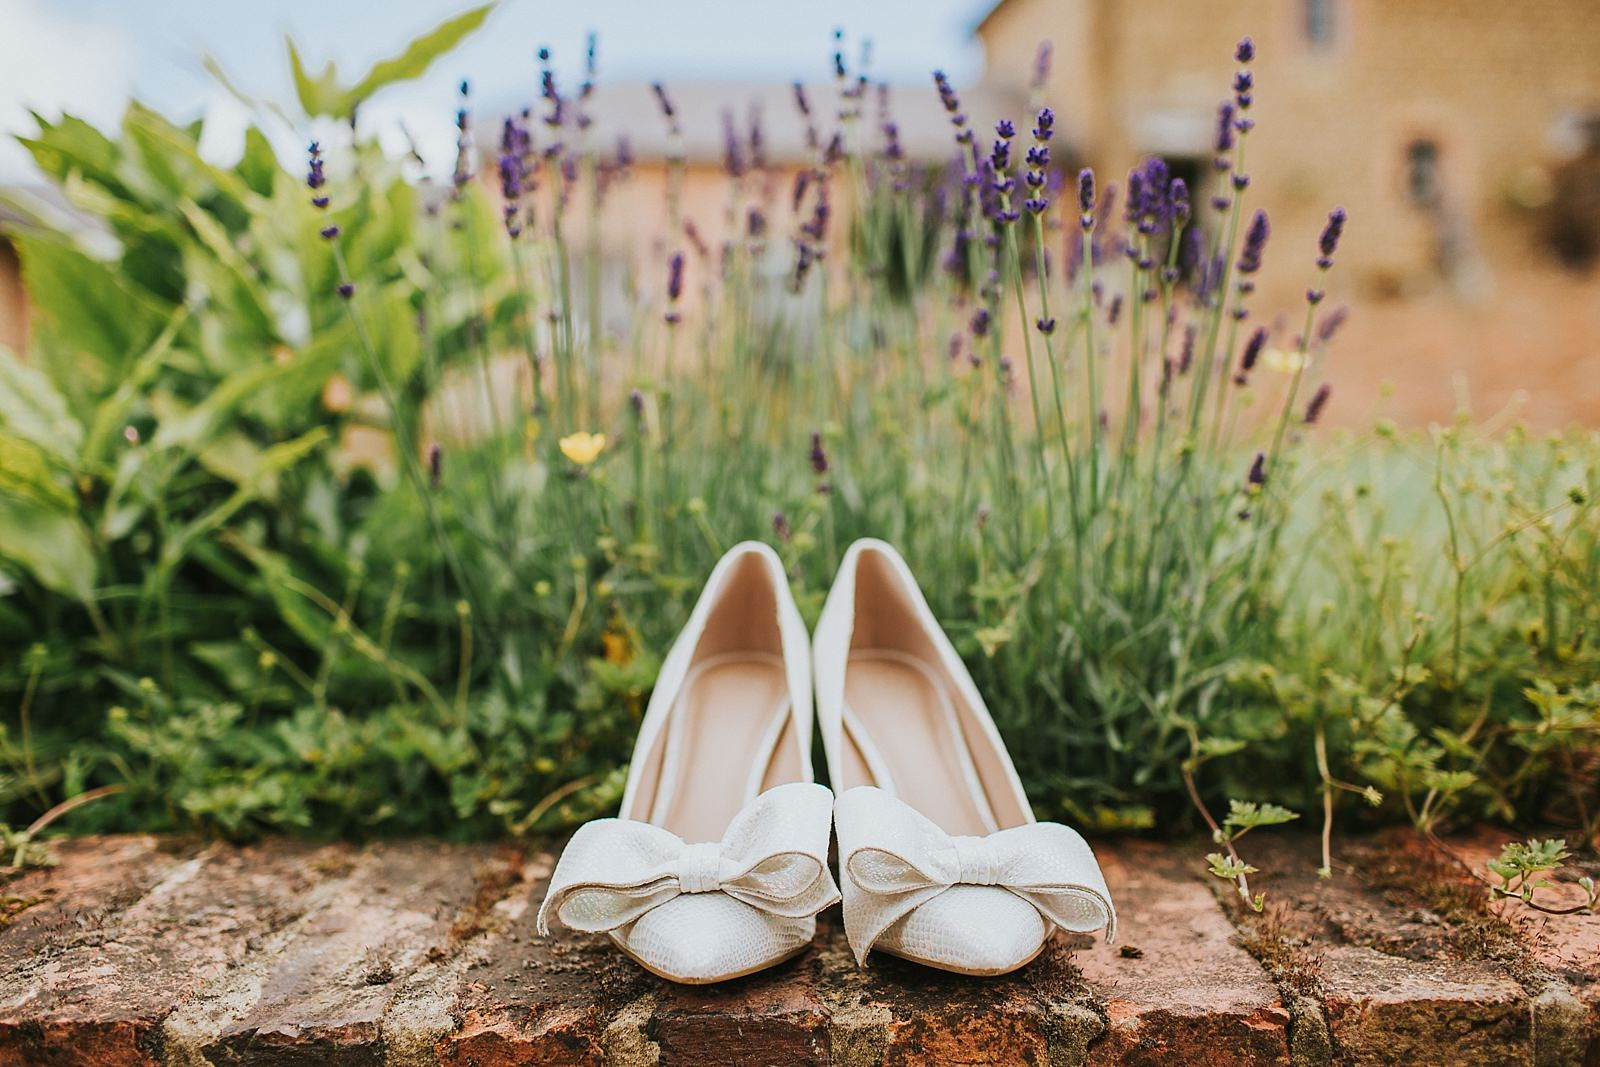 granary-at-fawsly-wedding-paula-stephen-006